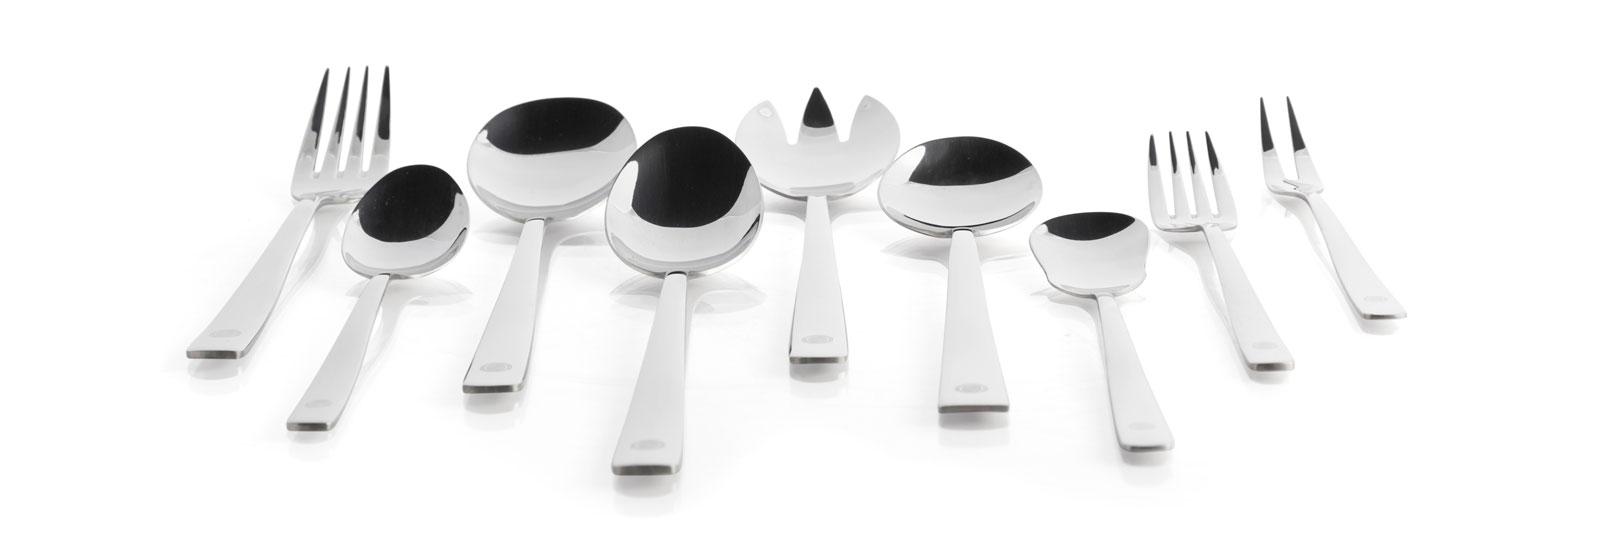 coockdlux-cutlery-set